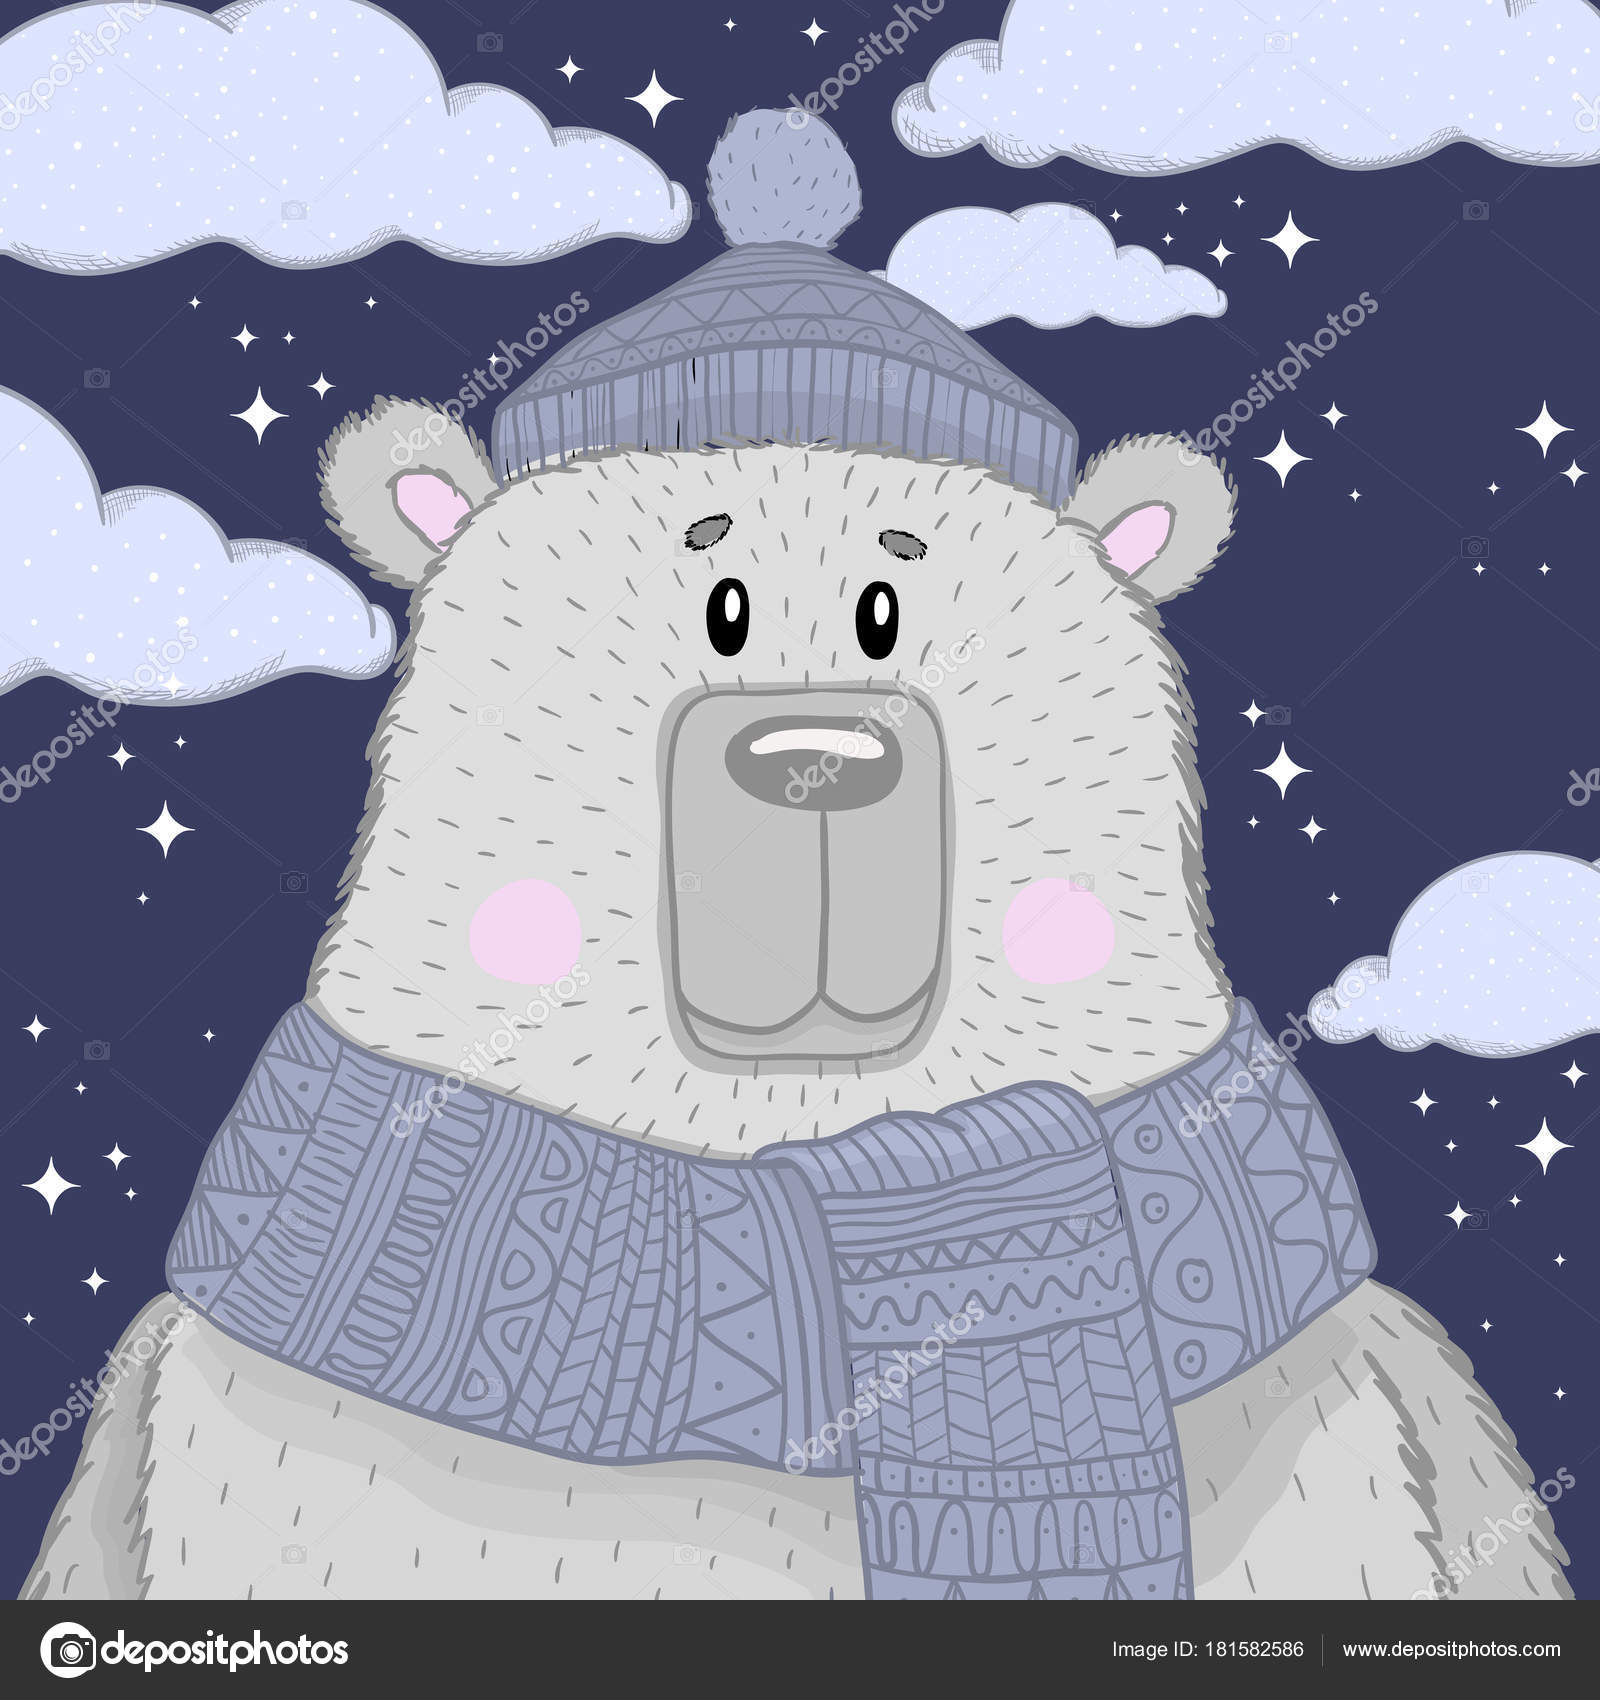 77a155d511 Μου μικρή αρκούδα κασκόλ και καπάκι. Τα παιδιά του γραφικού. Διάνυσμα χέρι  συρμένη απεικόνιση